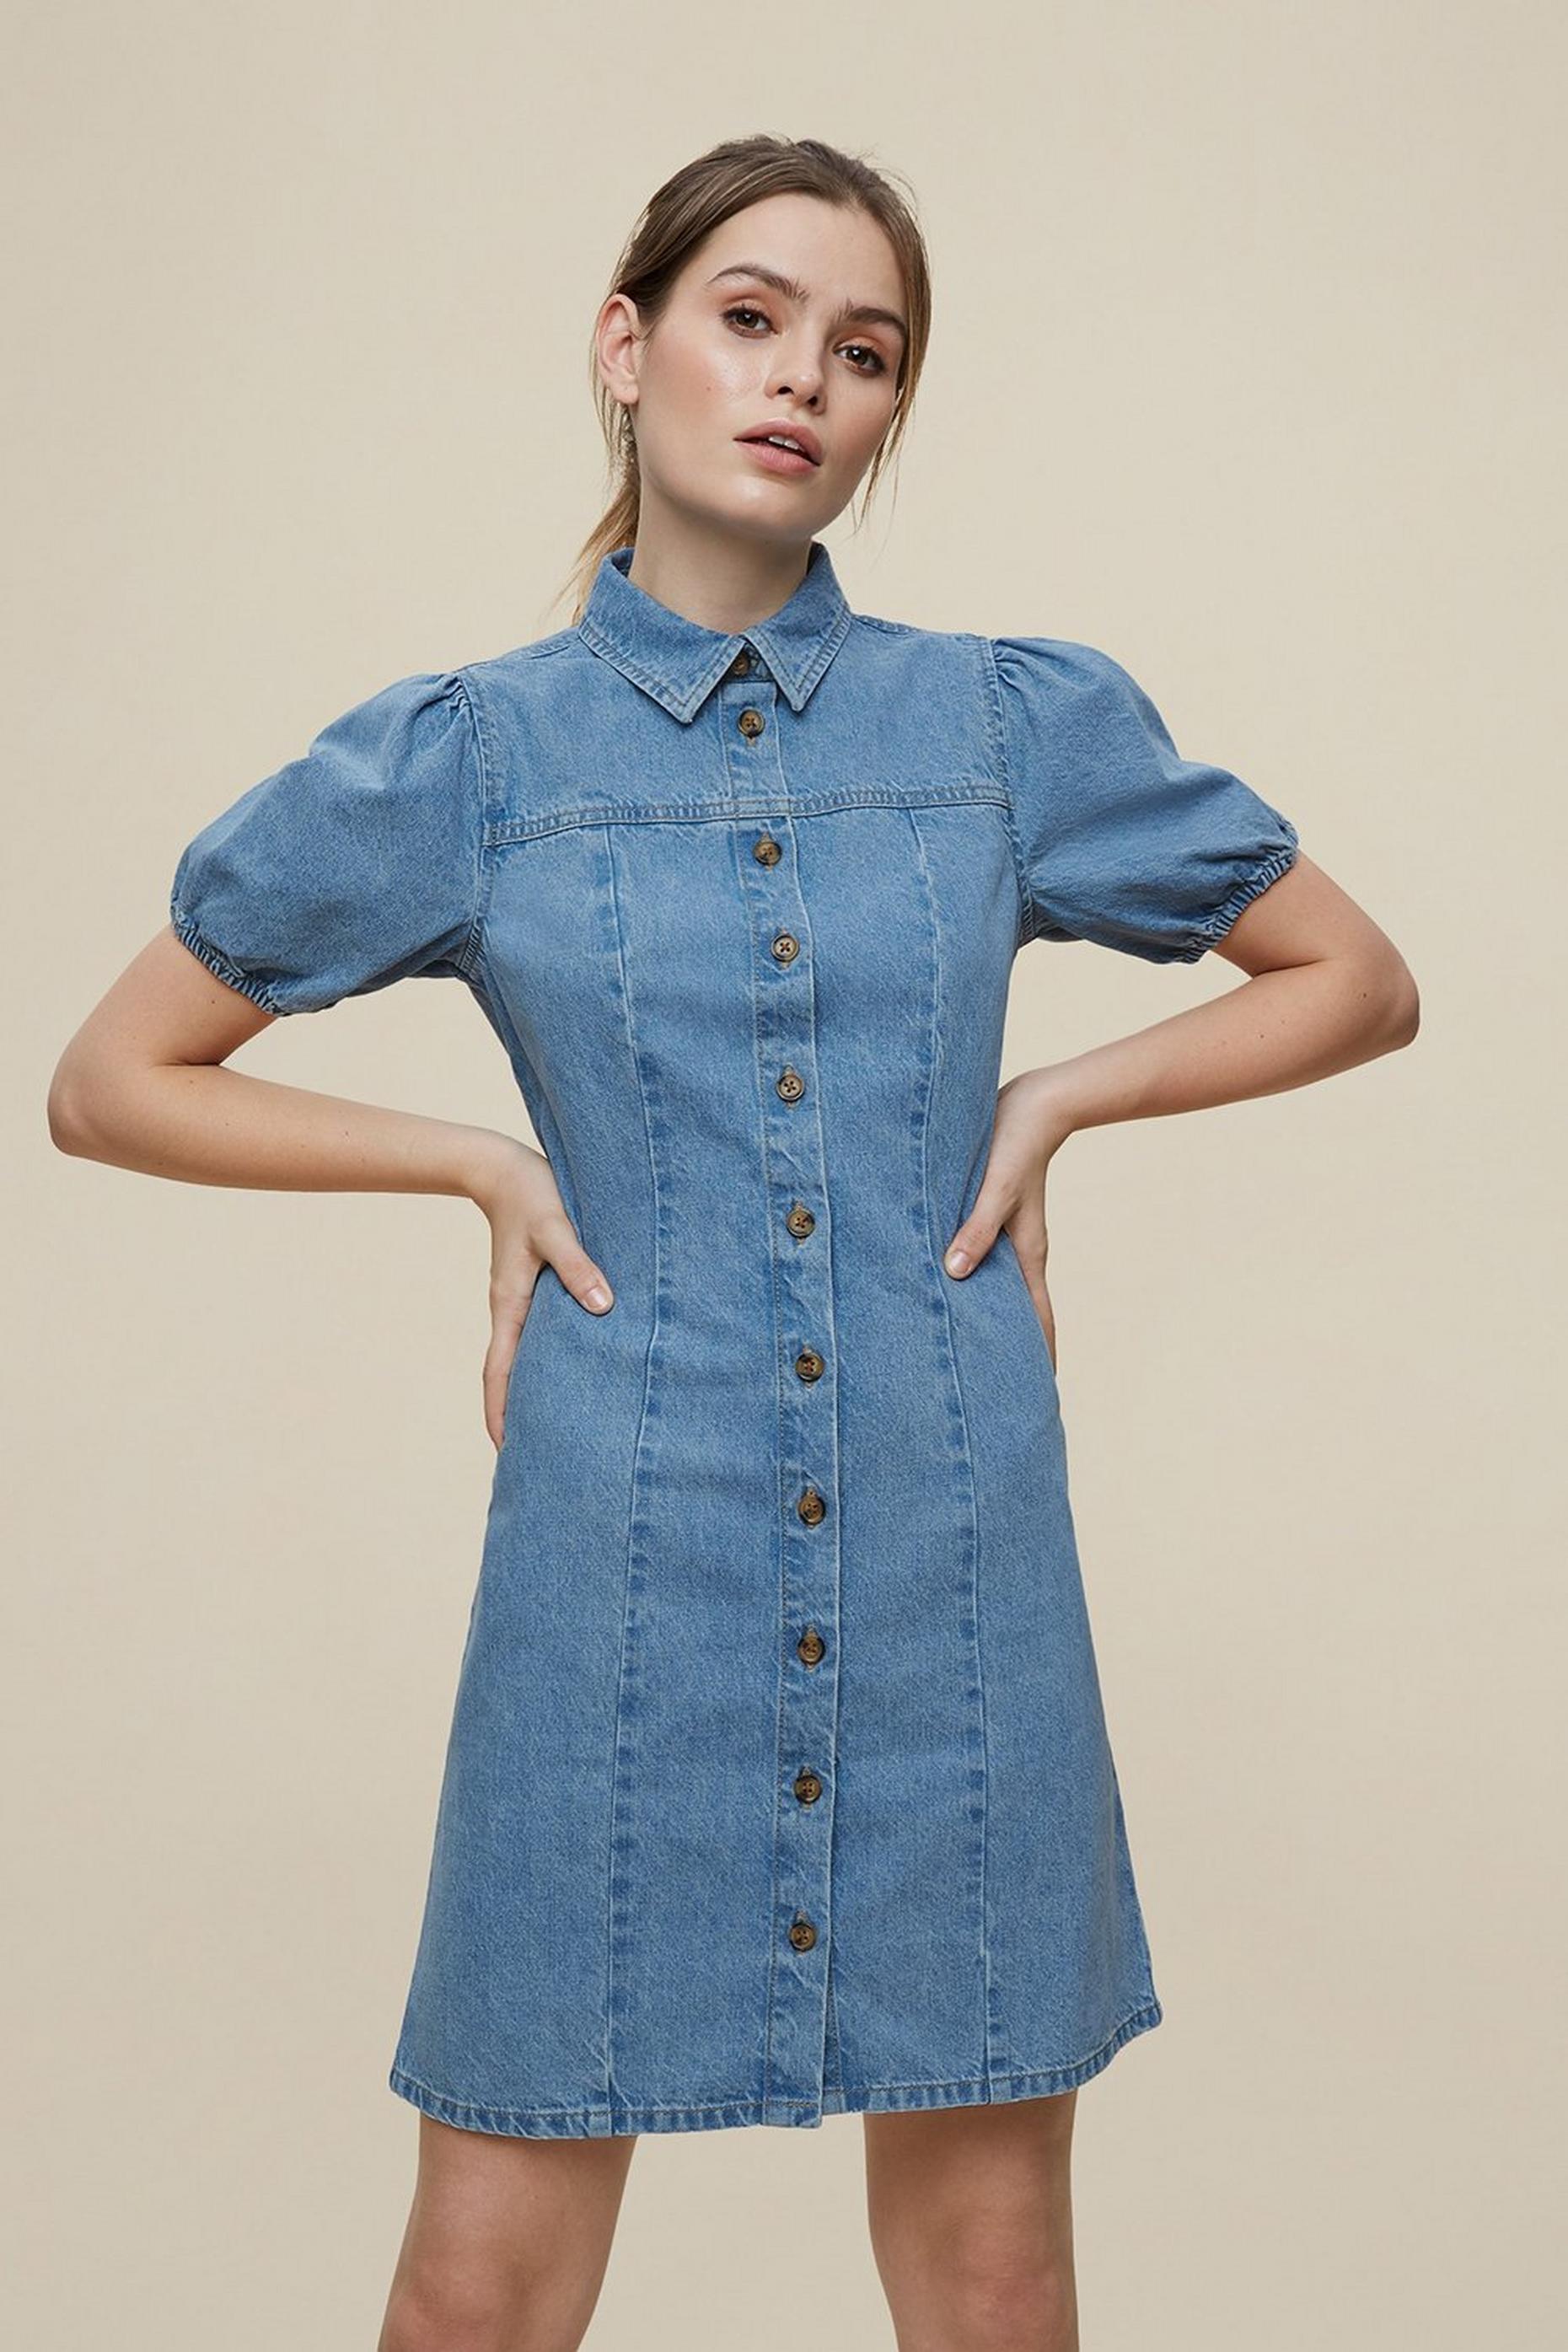 Denim Dresses | Denim Shift & Shirt Dresses | Dorothy Perkins